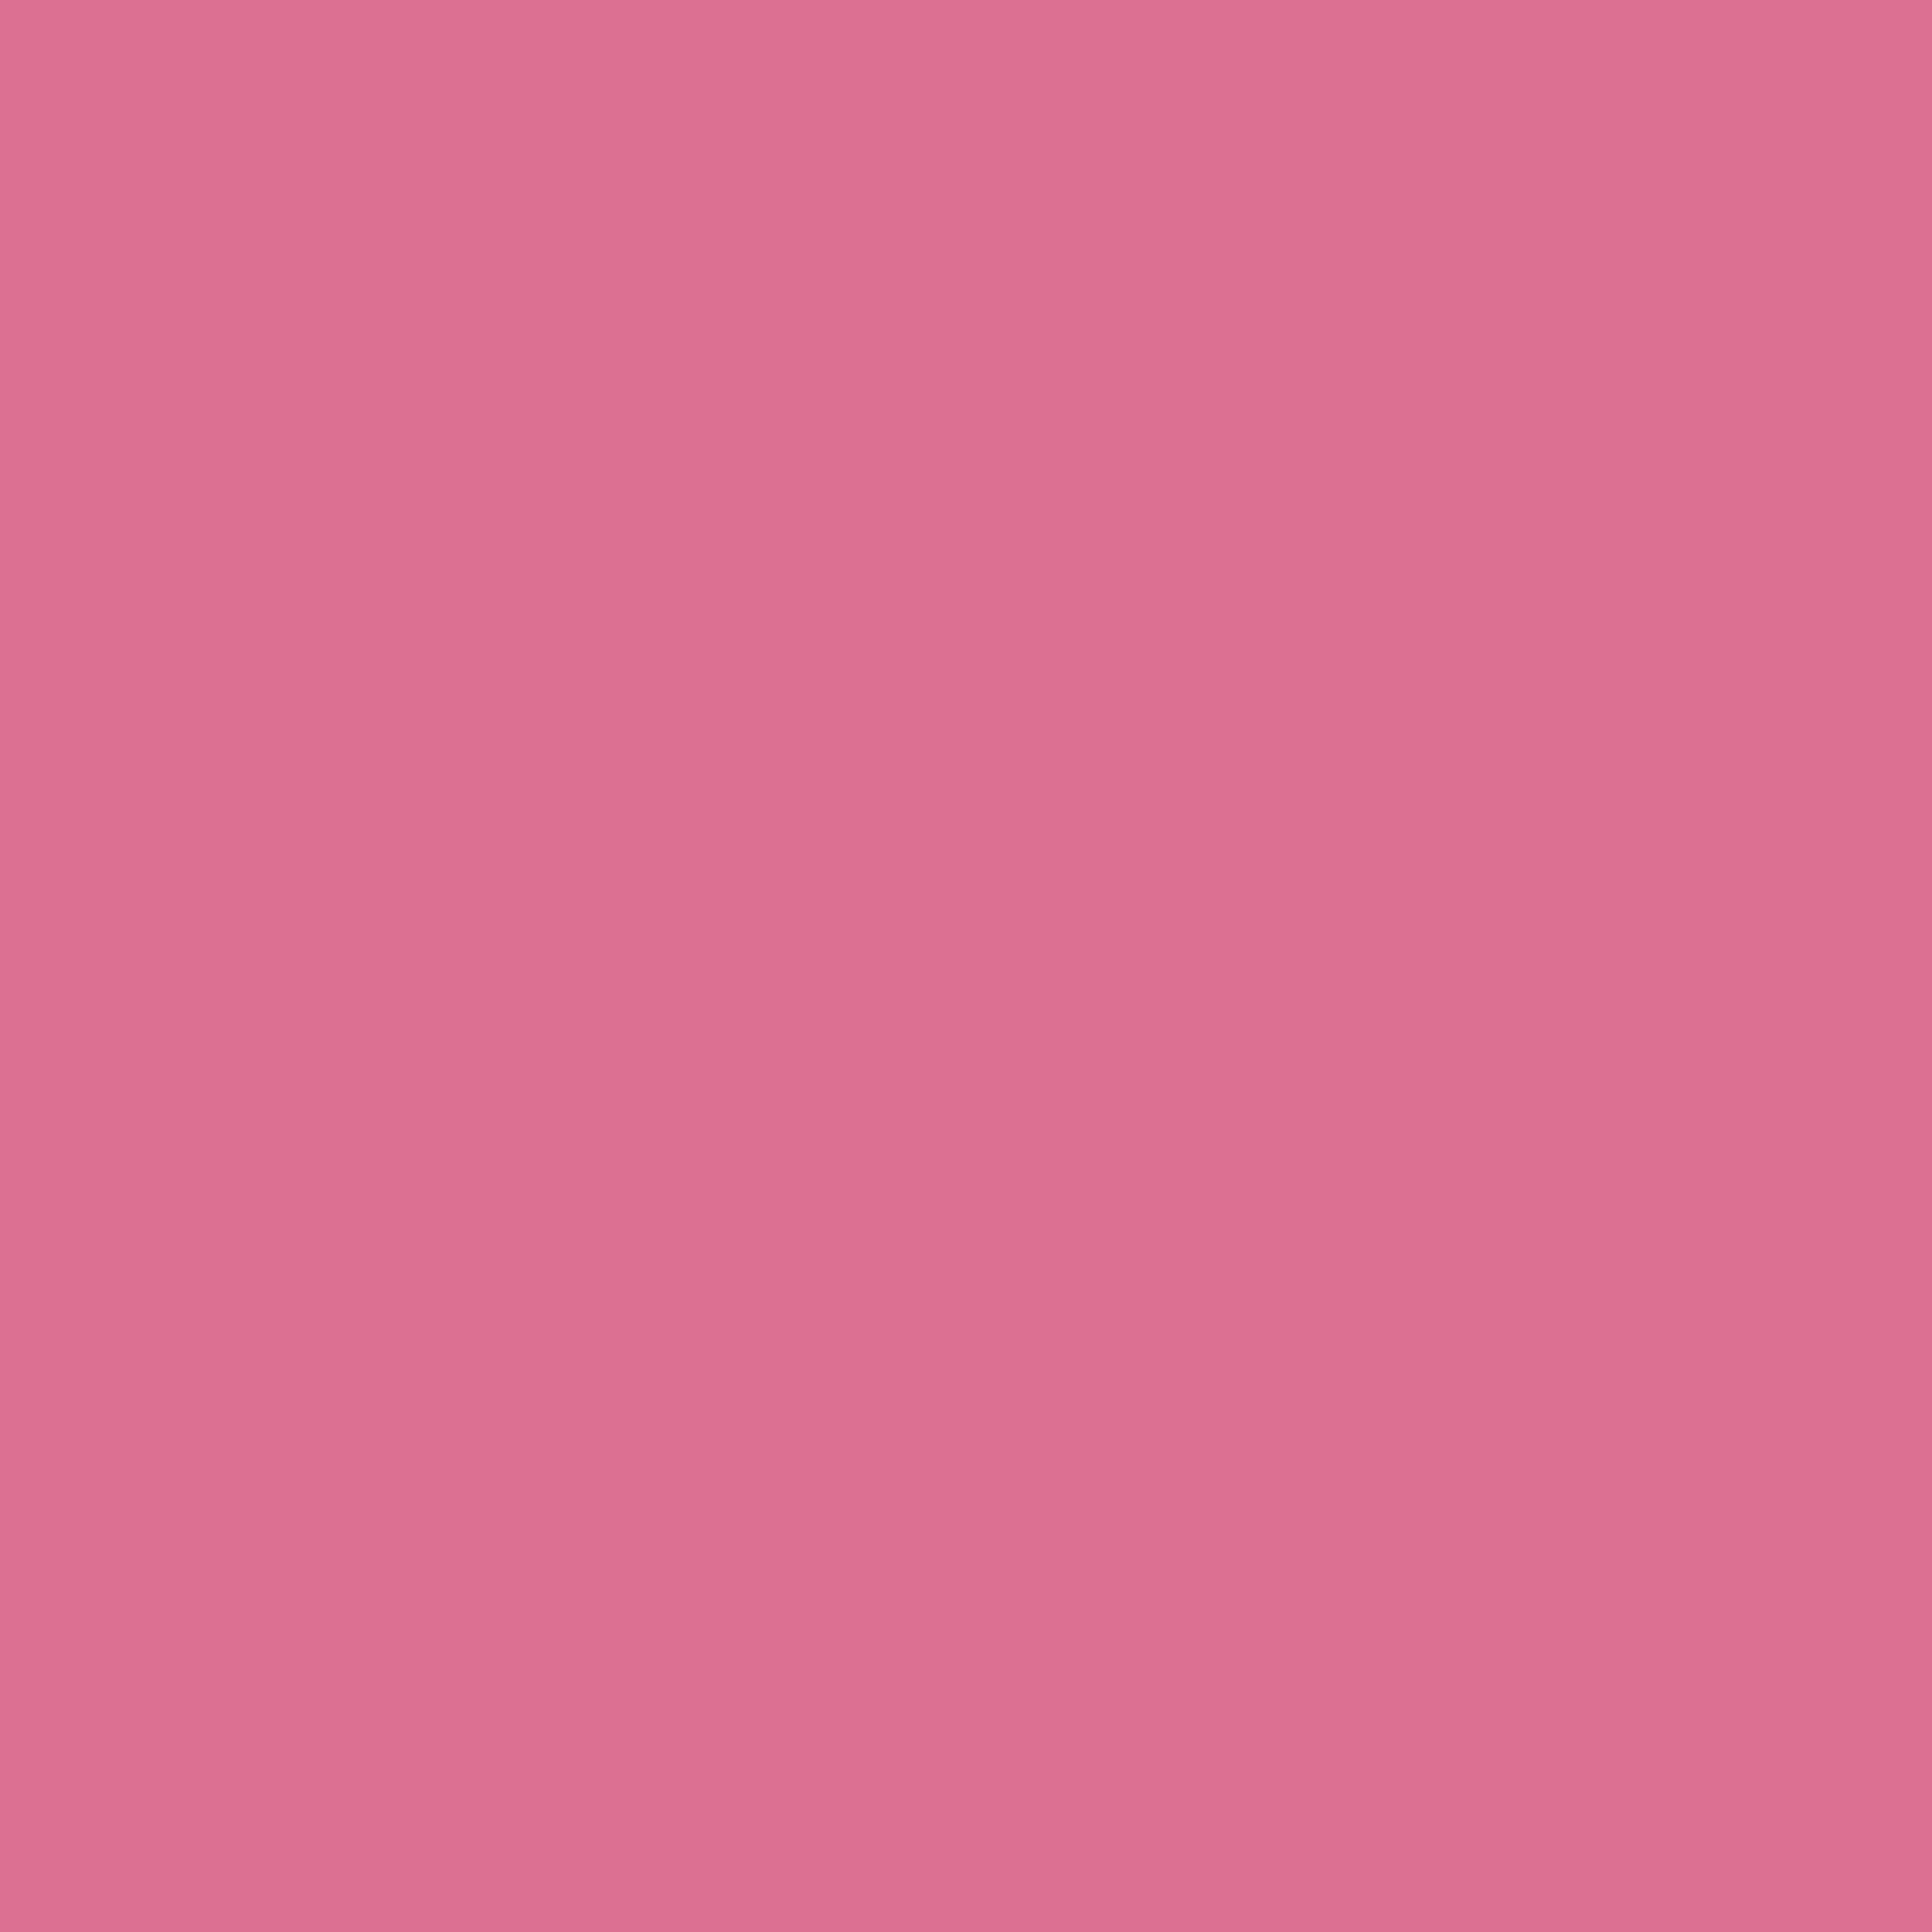 3600x3600 Pale Red-violet Solid Color Background